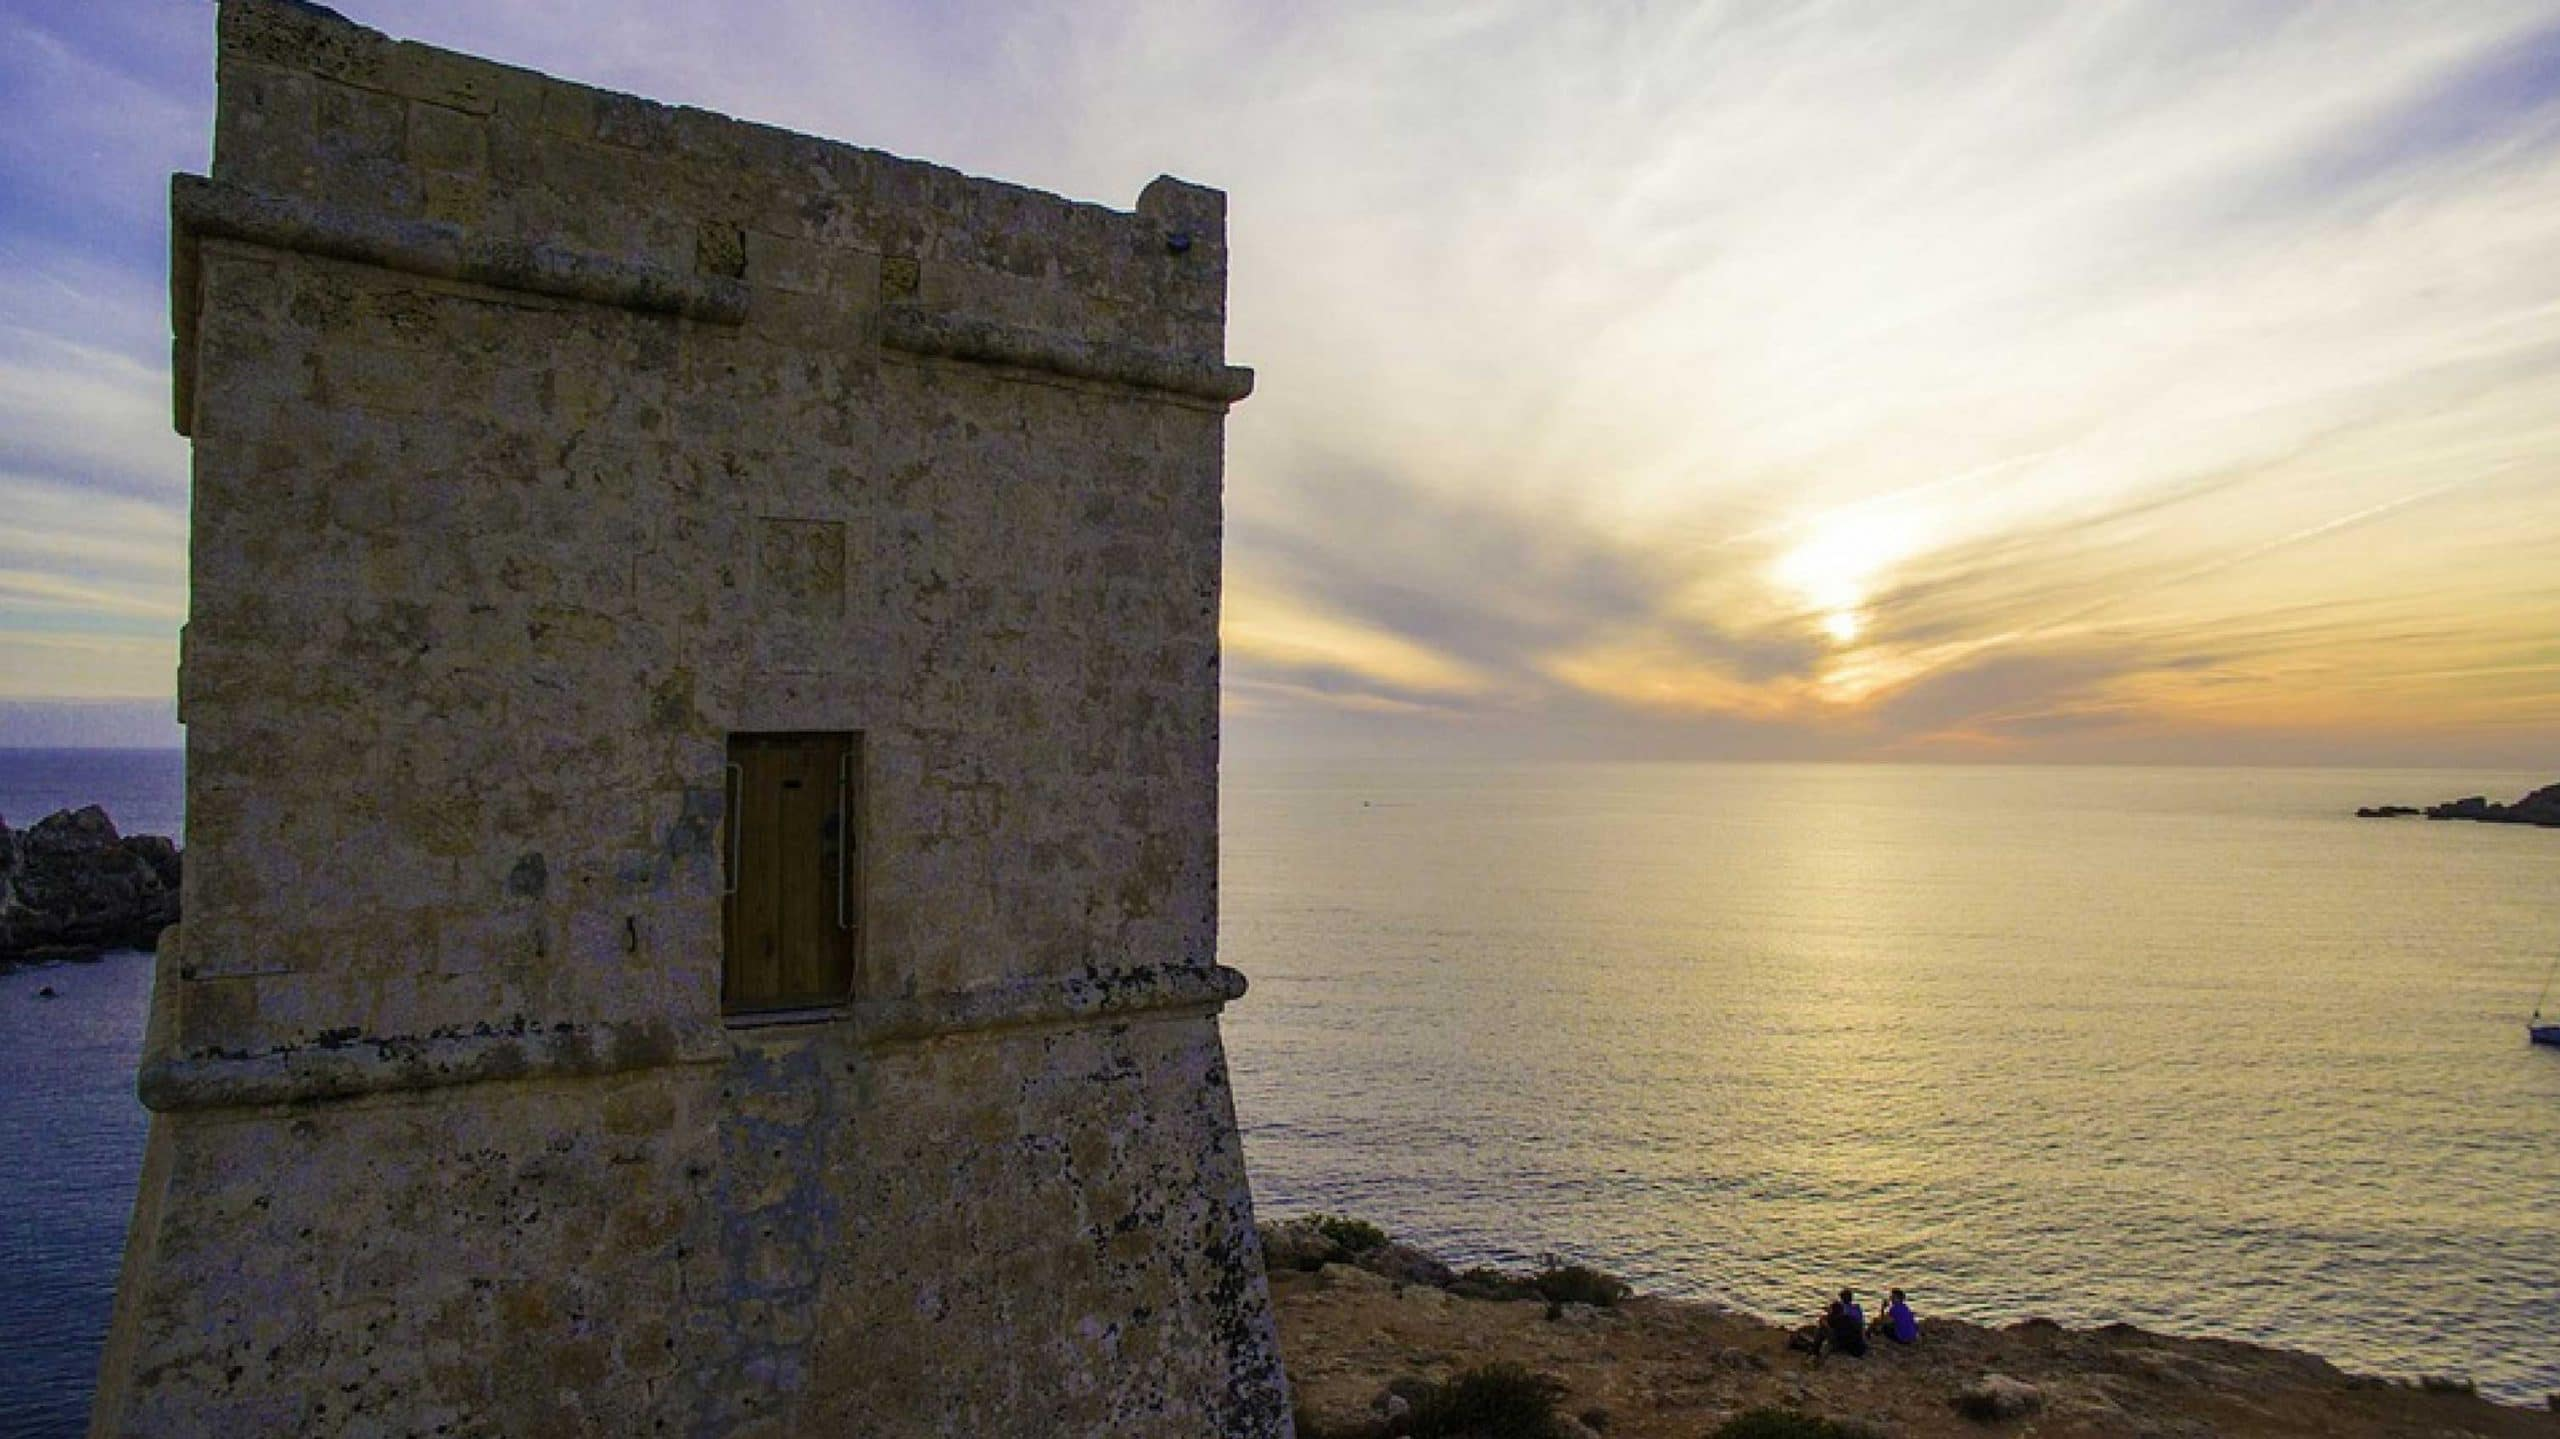 lookout tower Malta Gozo